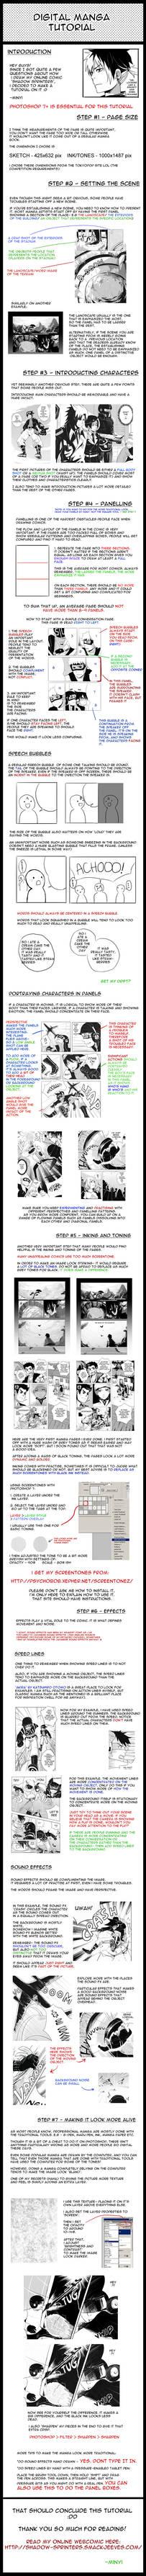 Digital Manga Tutorial